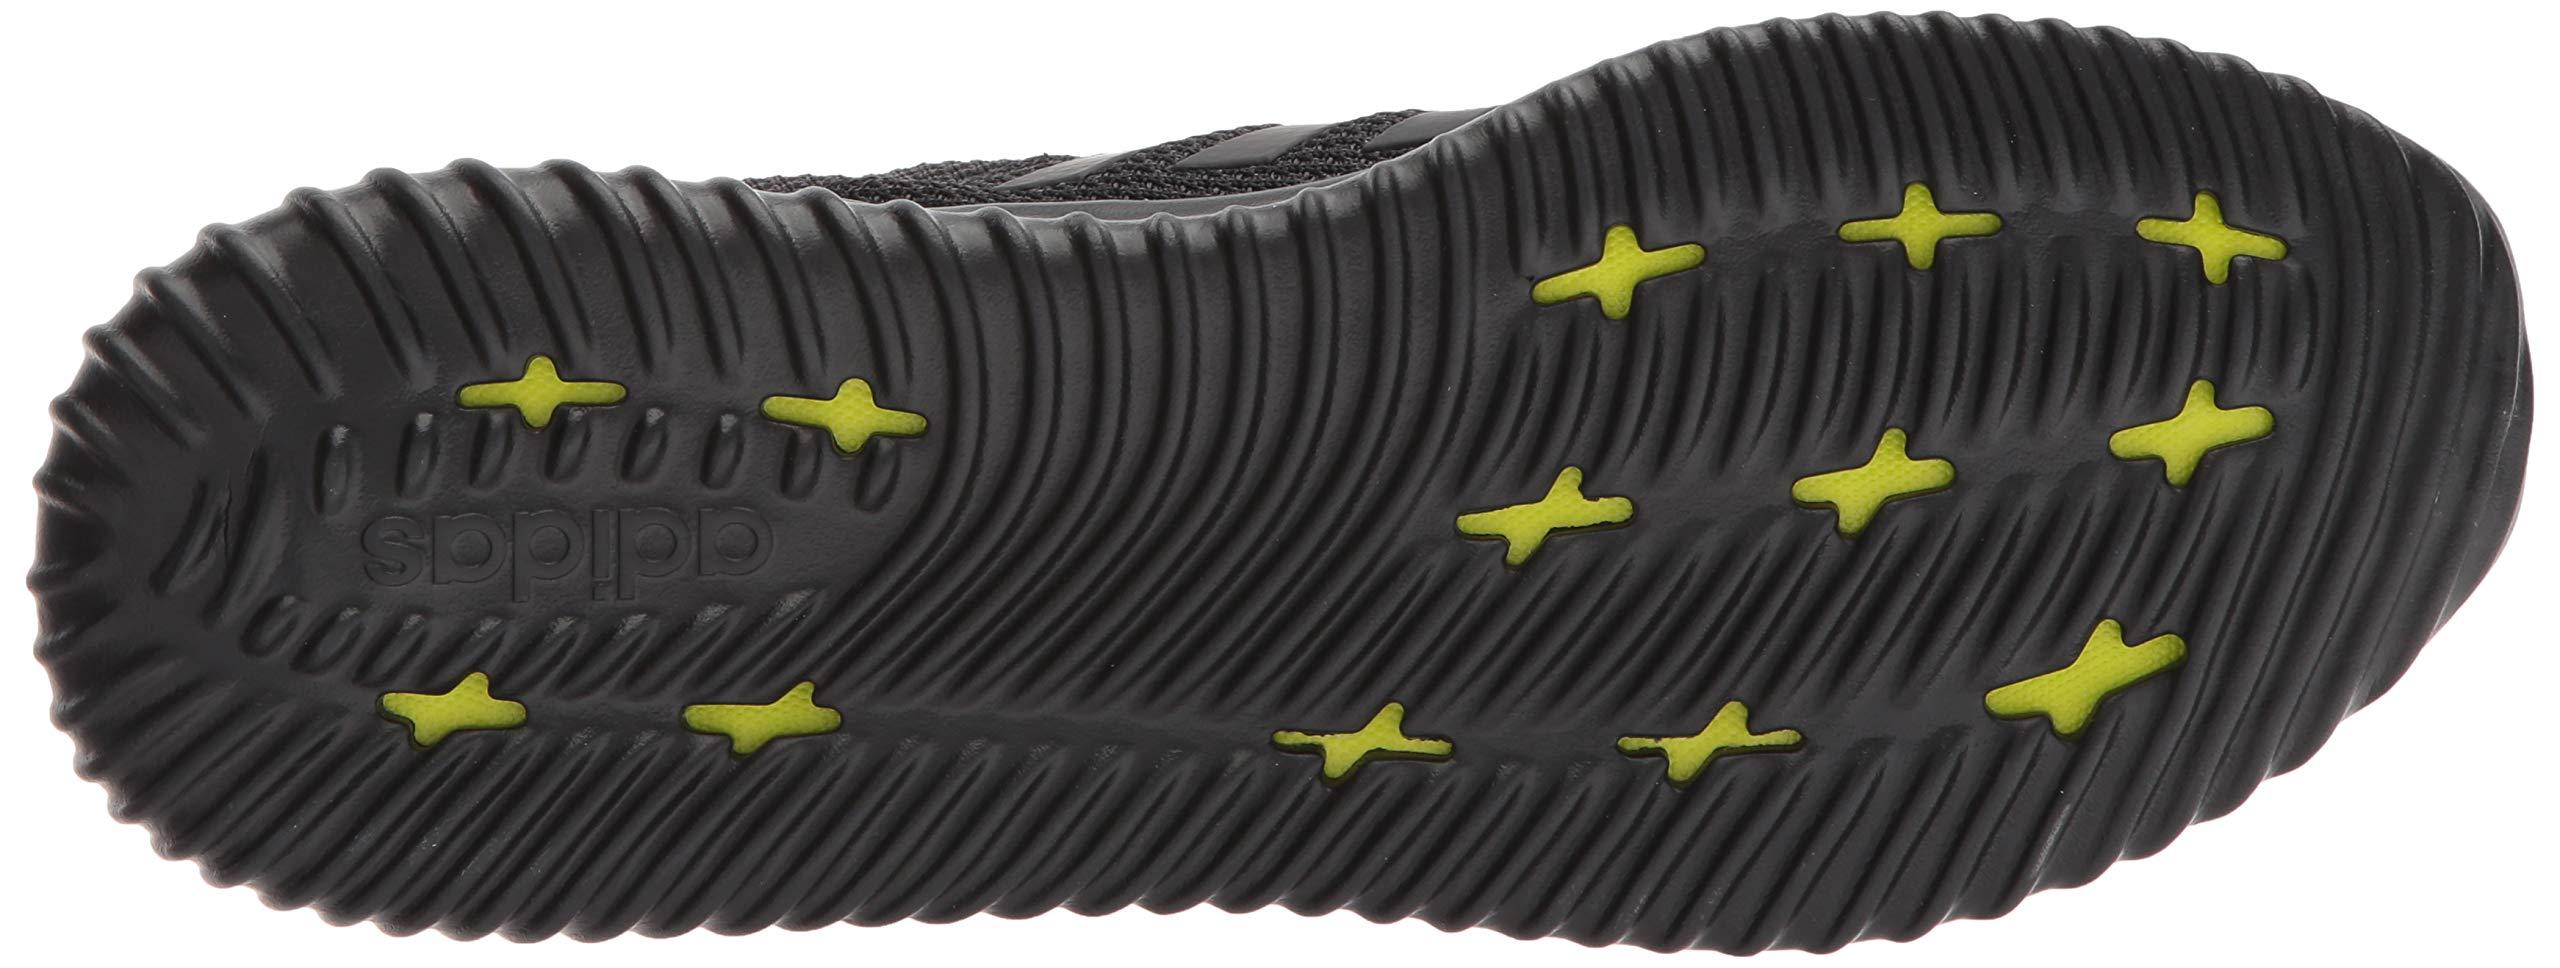 adidas Men's Cloudfoam Ultimate Running Shoe Utility Black, 9.5 M US by adidas (Image #3)